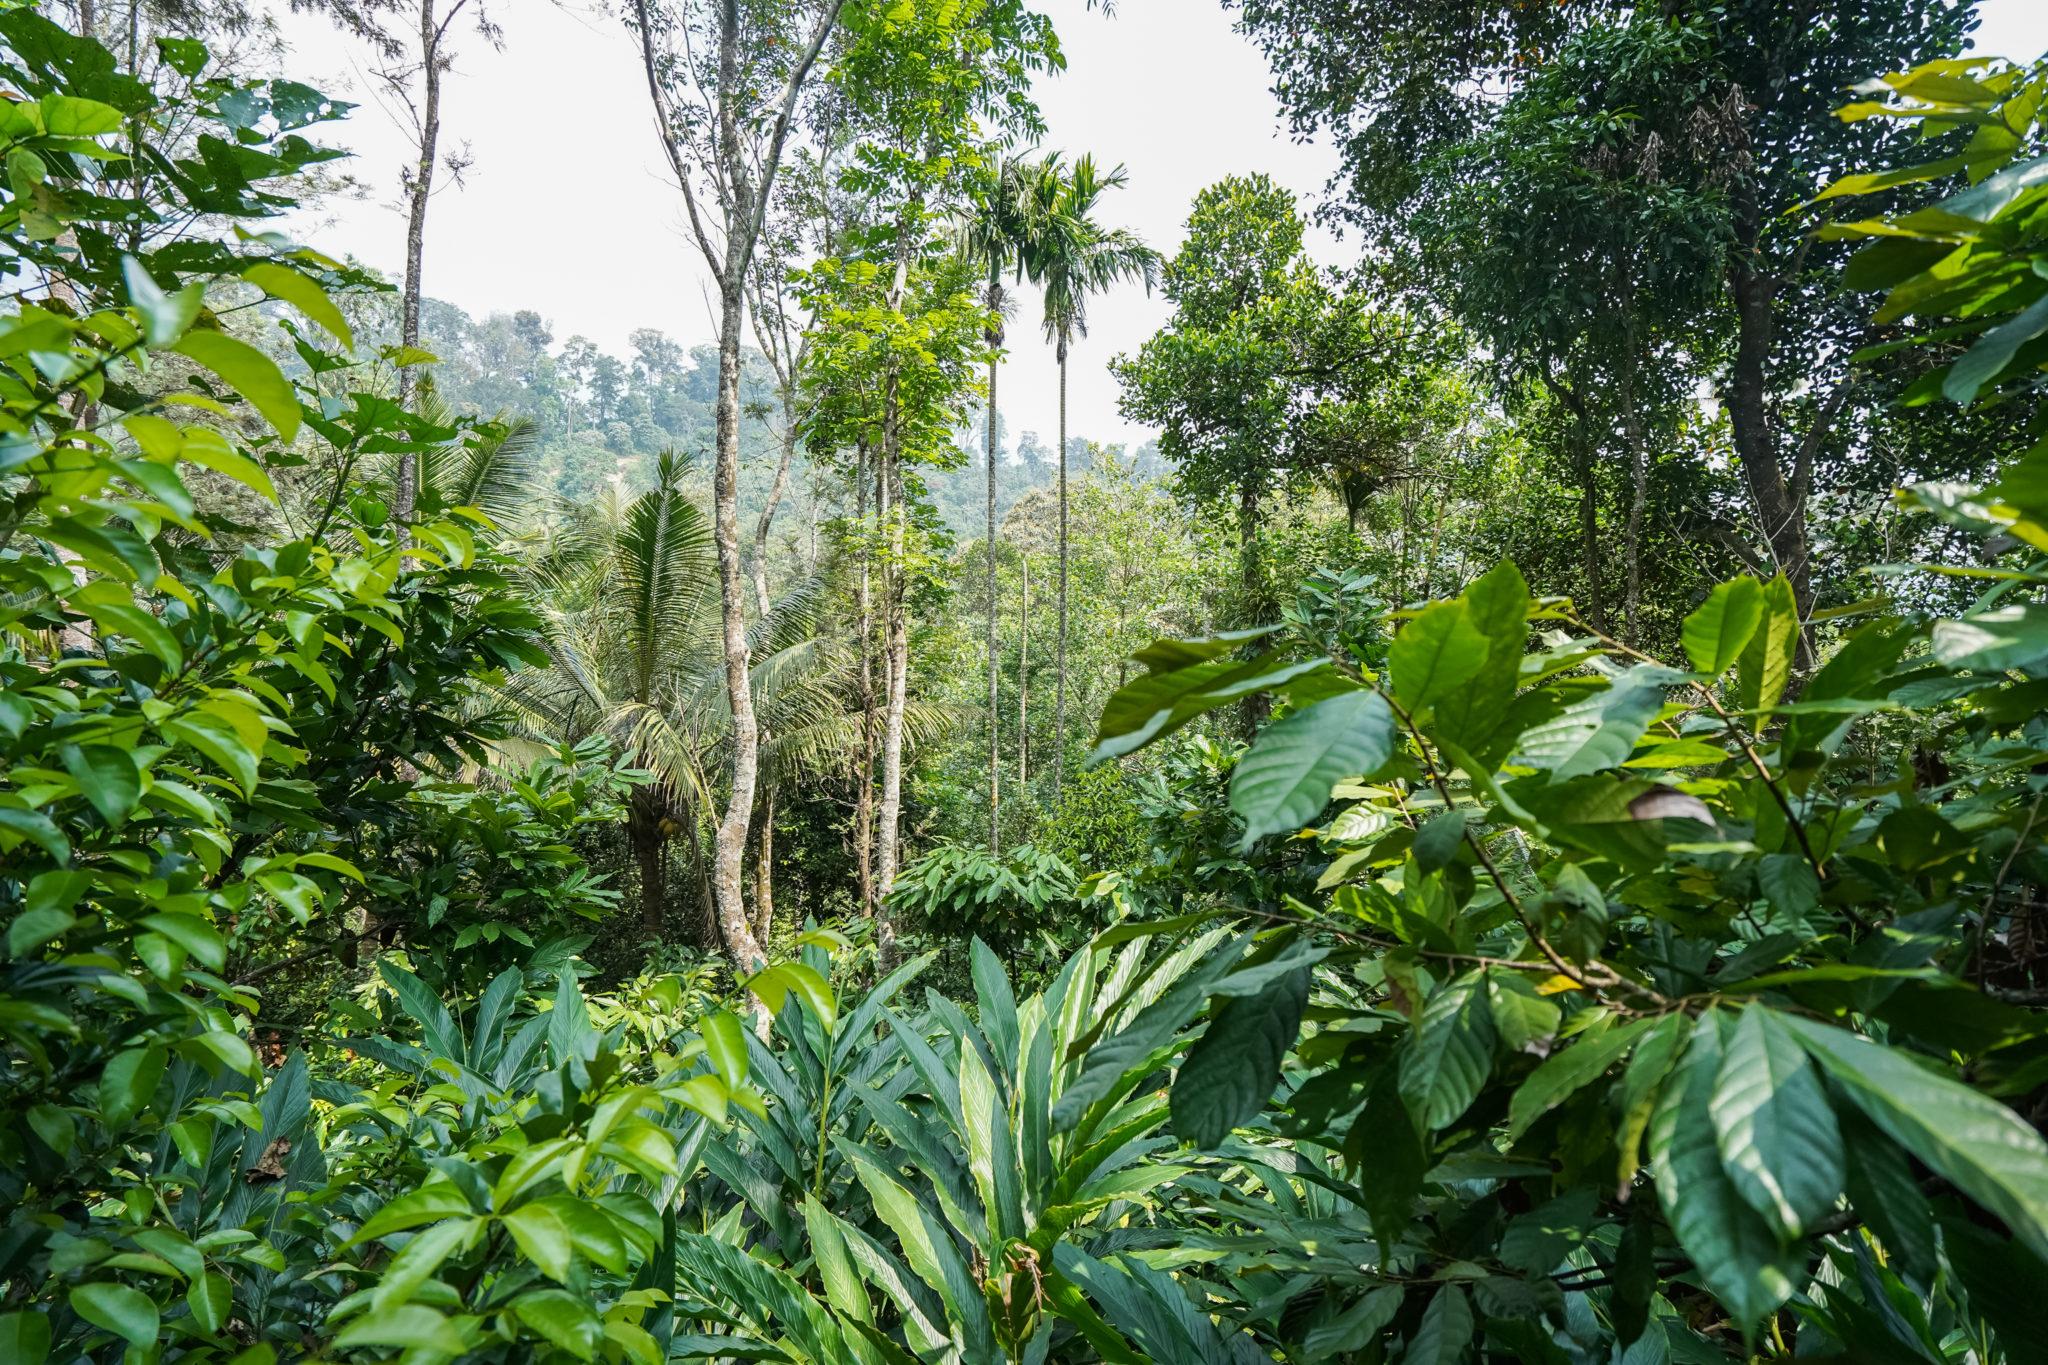 Kerala-munnar-plantation-épice-thé-visite-inde